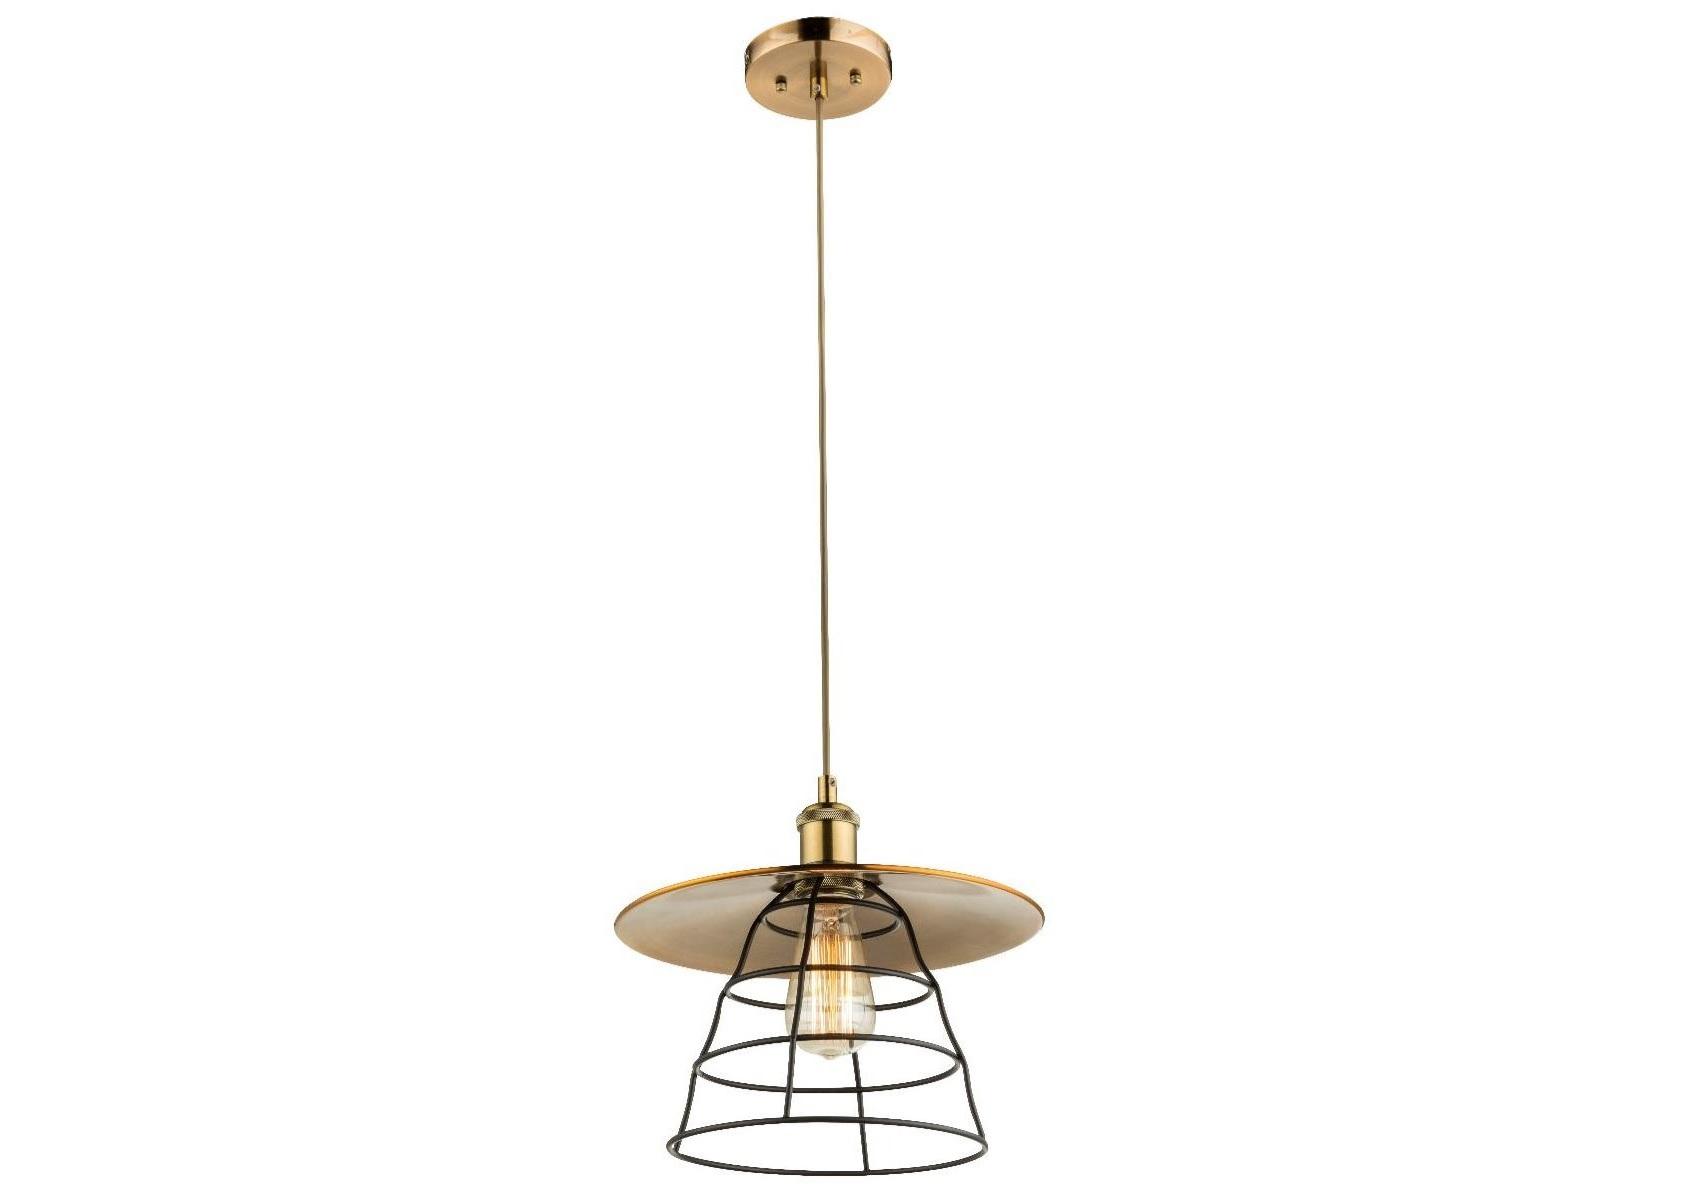 Светильник подвеснойПодвесные светильники<br>&amp;lt;div&amp;gt;&amp;lt;div&amp;gt;Вид цоколя: E27&amp;lt;/div&amp;gt;&amp;lt;div&amp;gt;Мощность лампы: 60W&amp;lt;/div&amp;gt;&amp;lt;div&amp;gt;Количество ламп: 1&amp;lt;/div&amp;gt;&amp;lt;/div&amp;gt;<br><br>Material: Металл<br>Высота см: 150